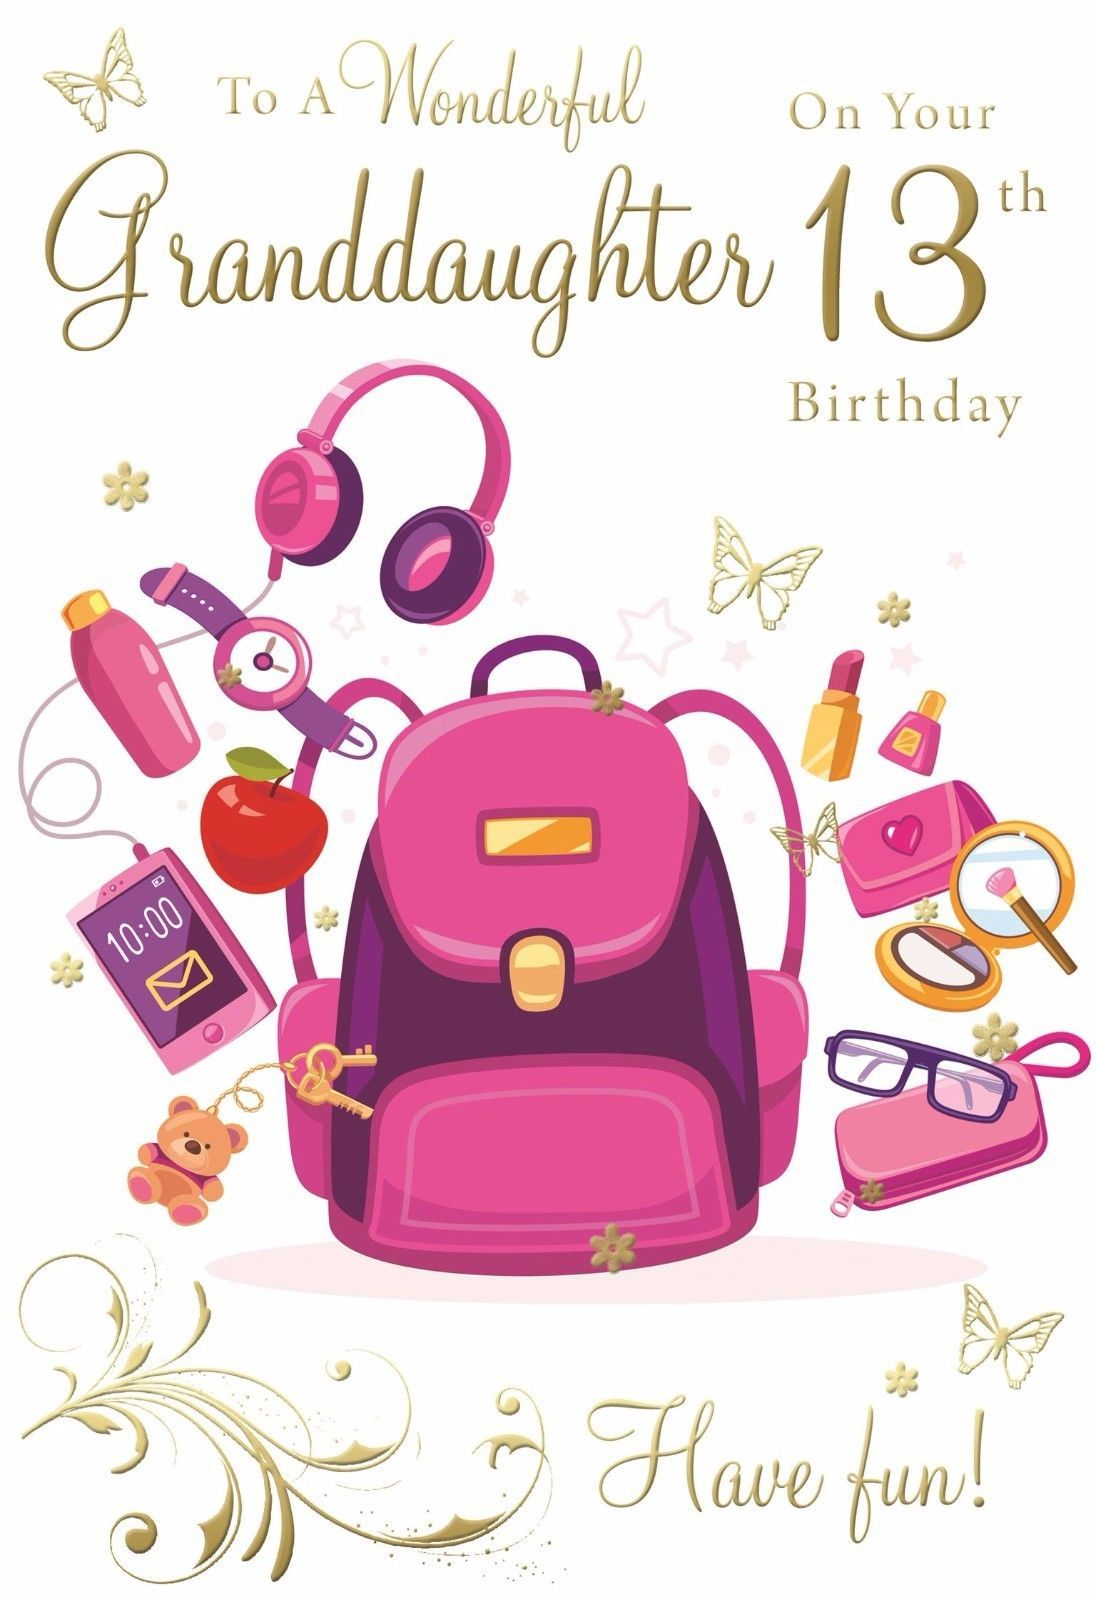 Born In August Female Flower Word Design Happy Birthday Card Lovely Verse Beautiful Birthday Cards 13th Birthday Wishes Free Happy Birthday Cards